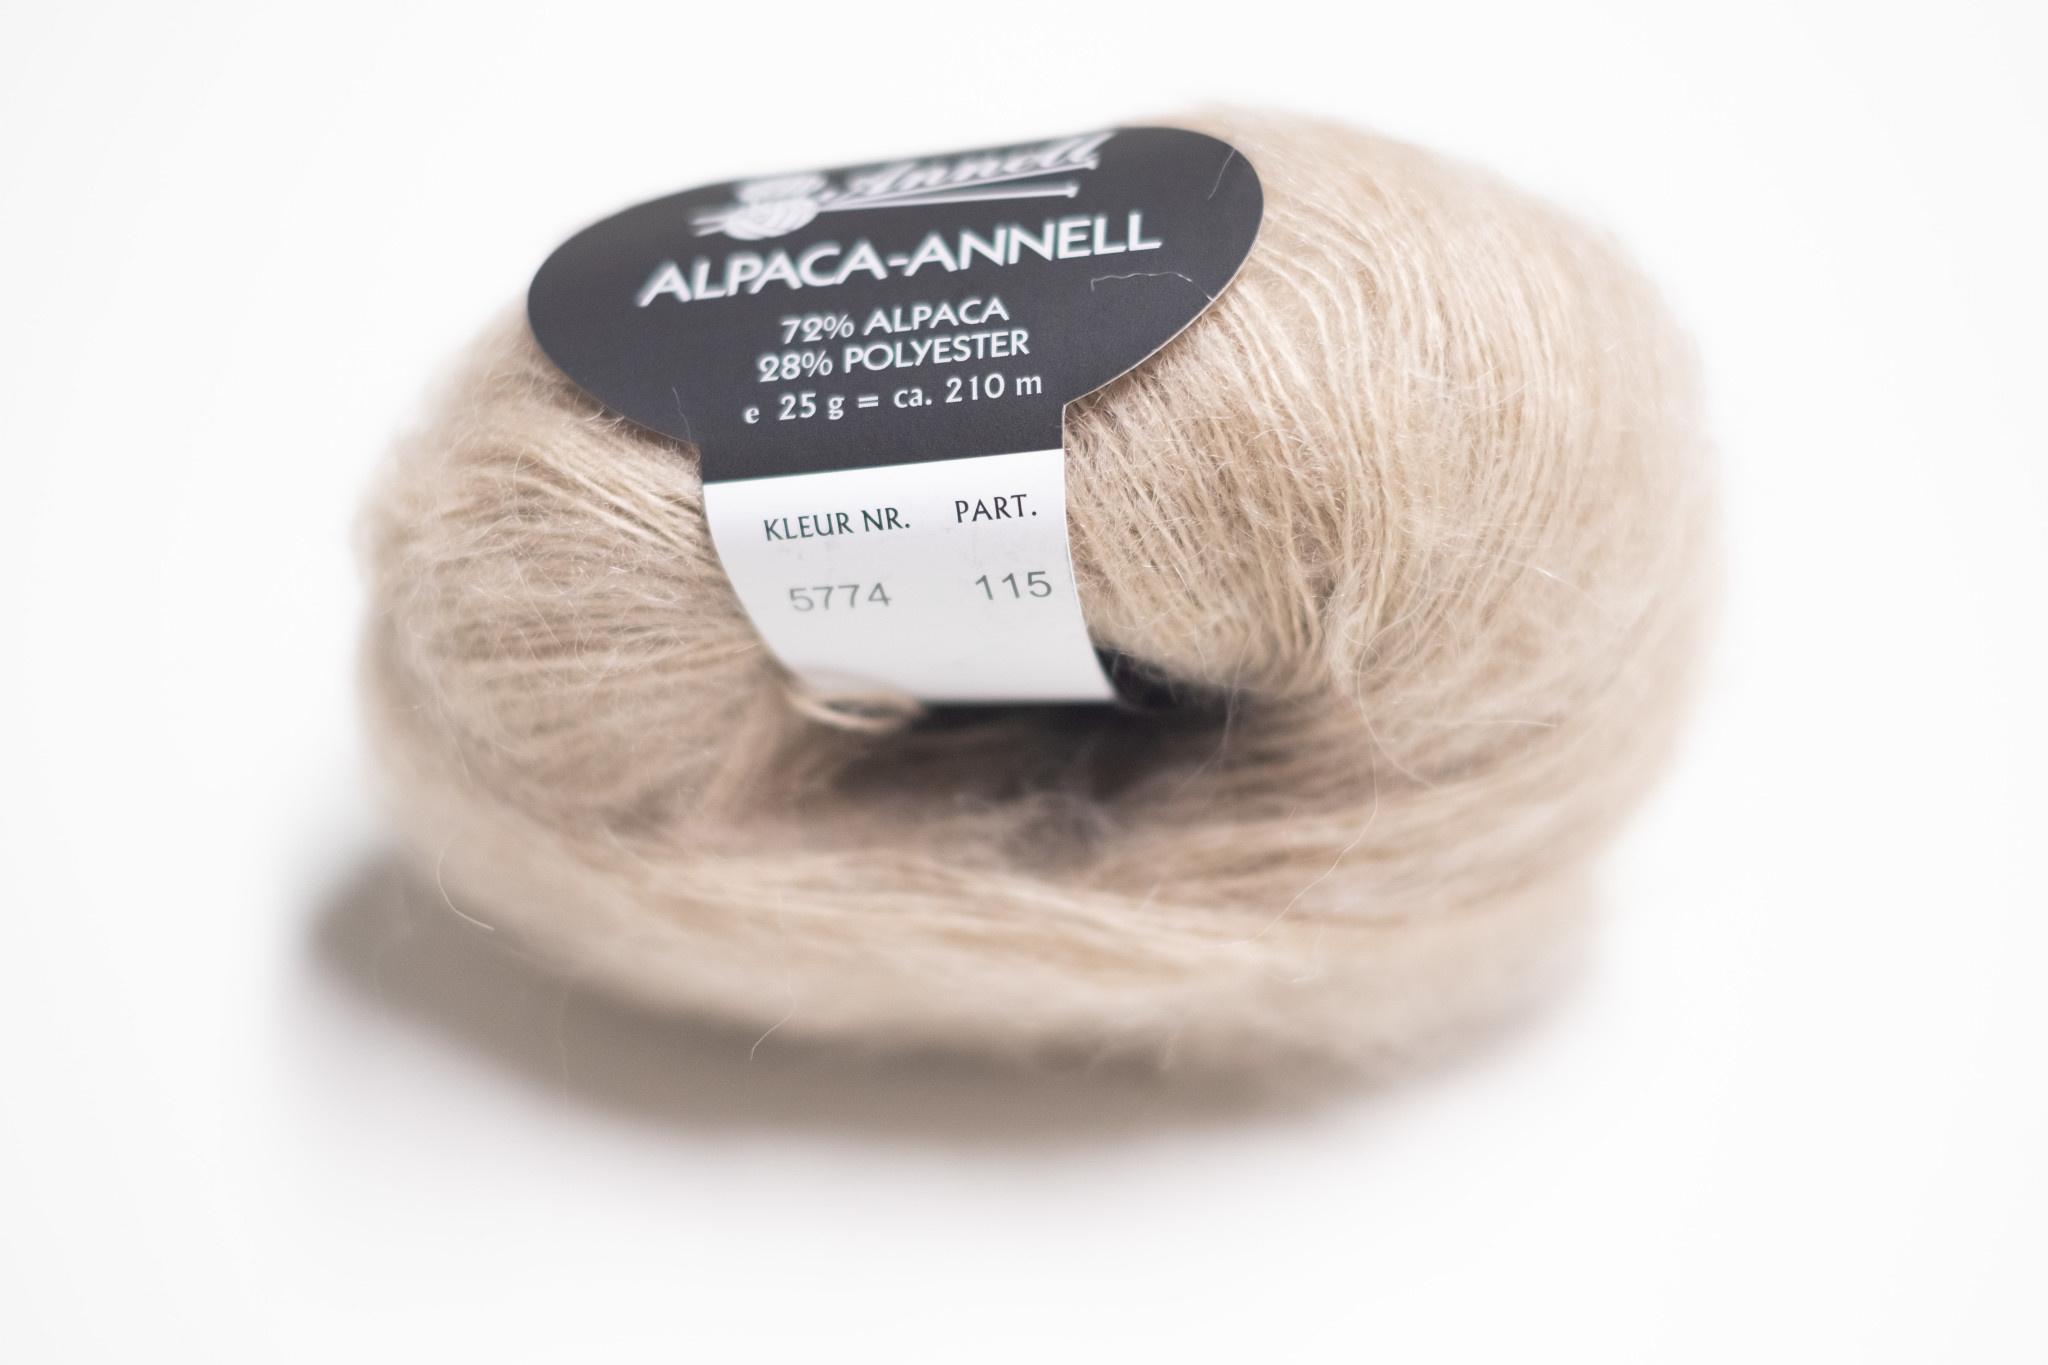 Annell Alpaca-Annell - kleur 5774